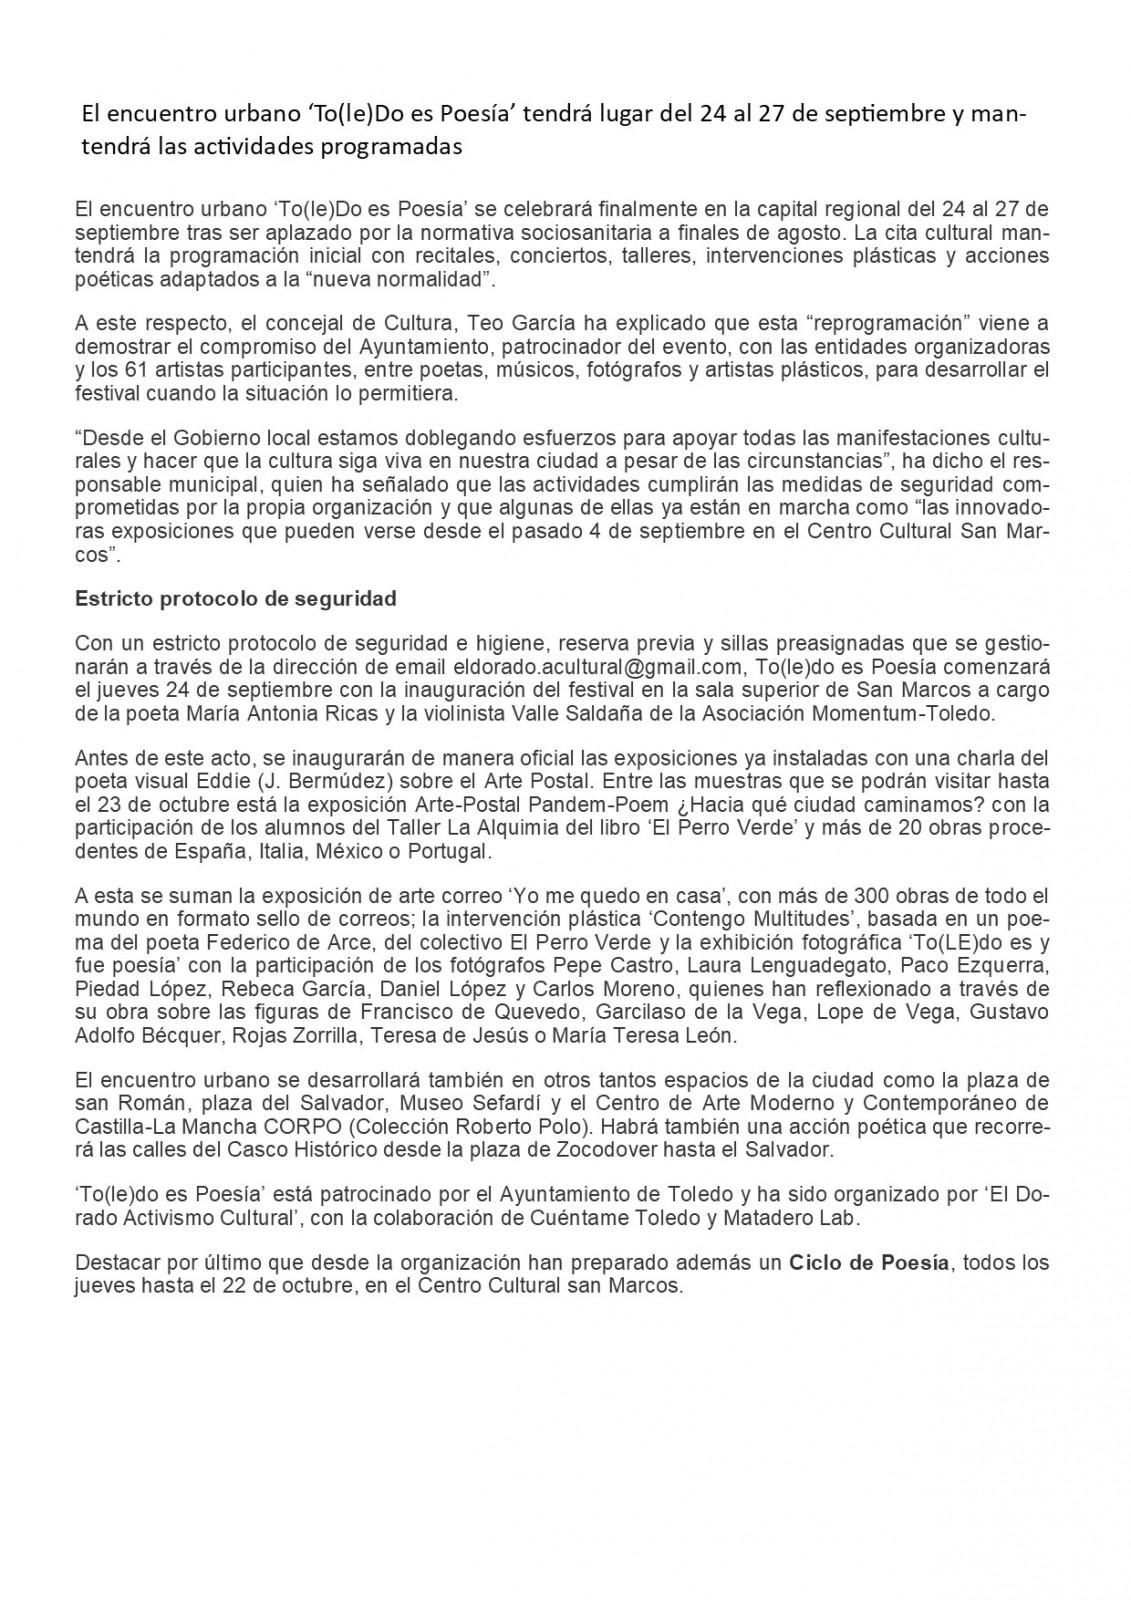 Toledo es poesia Cuerpo noticia